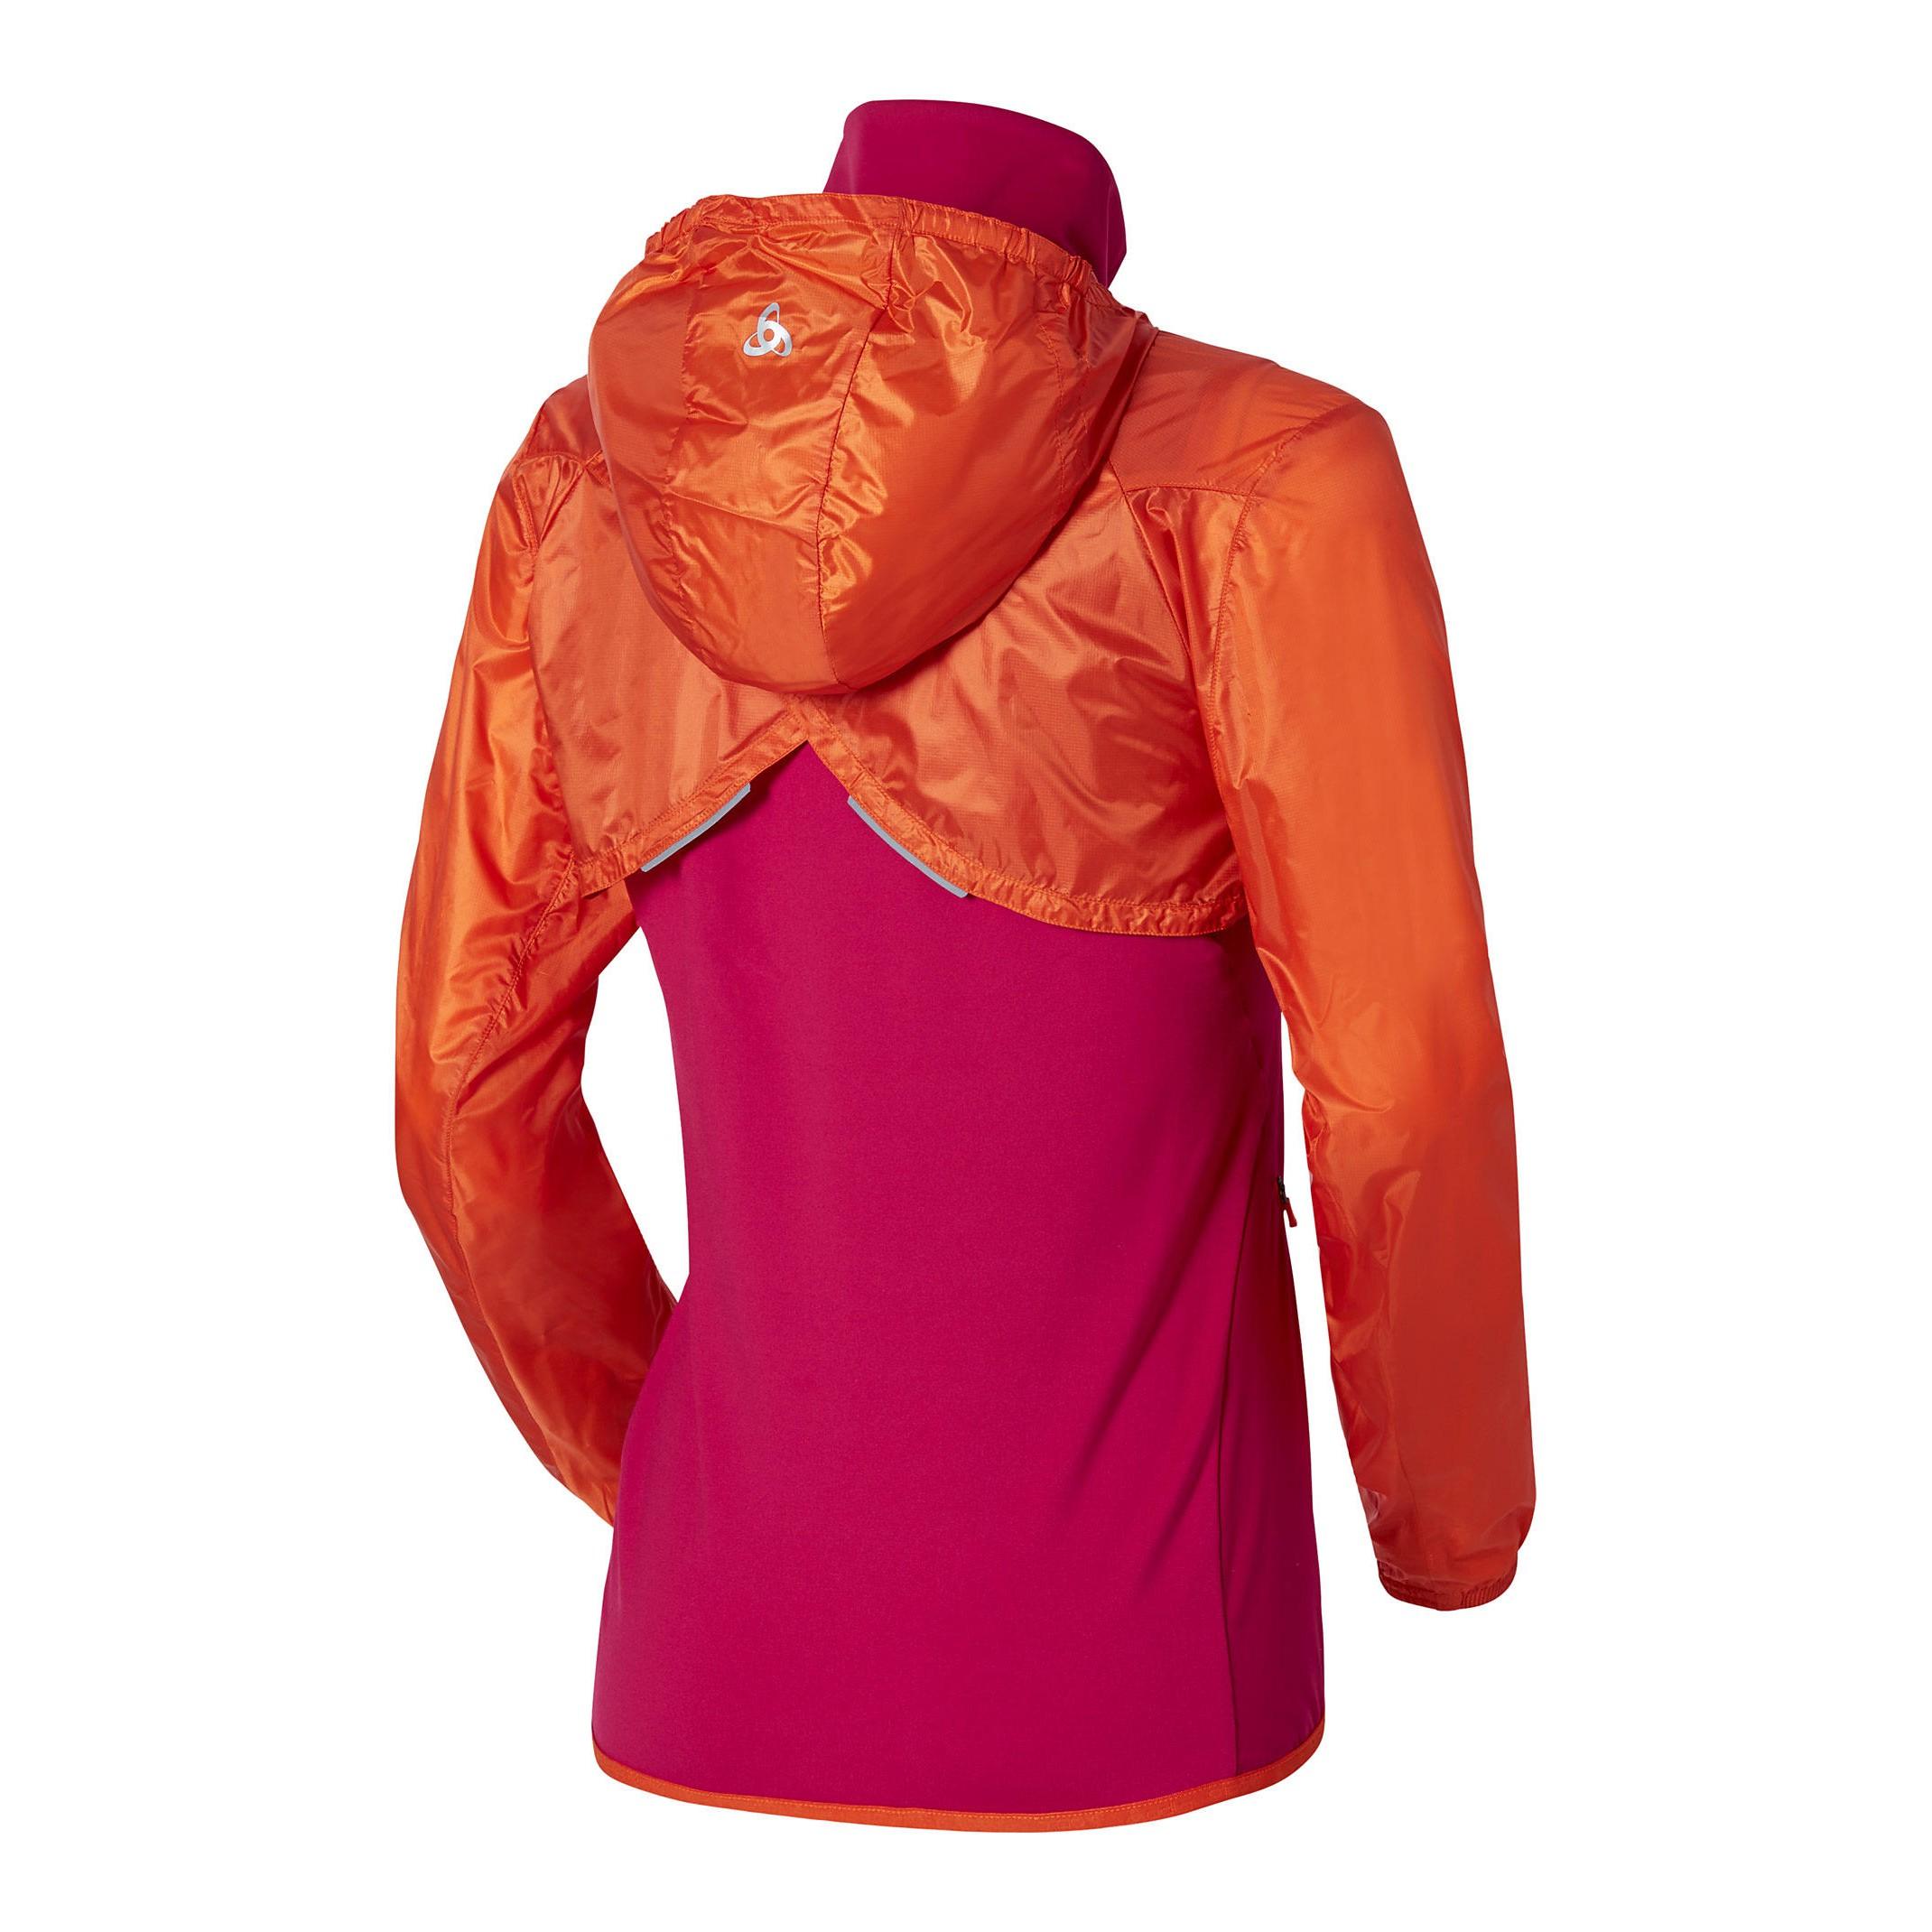 ODLO Veste coupe-vent Femme 3en 1 ZEROWEIGHT Rose Orange | Alltricks.fr